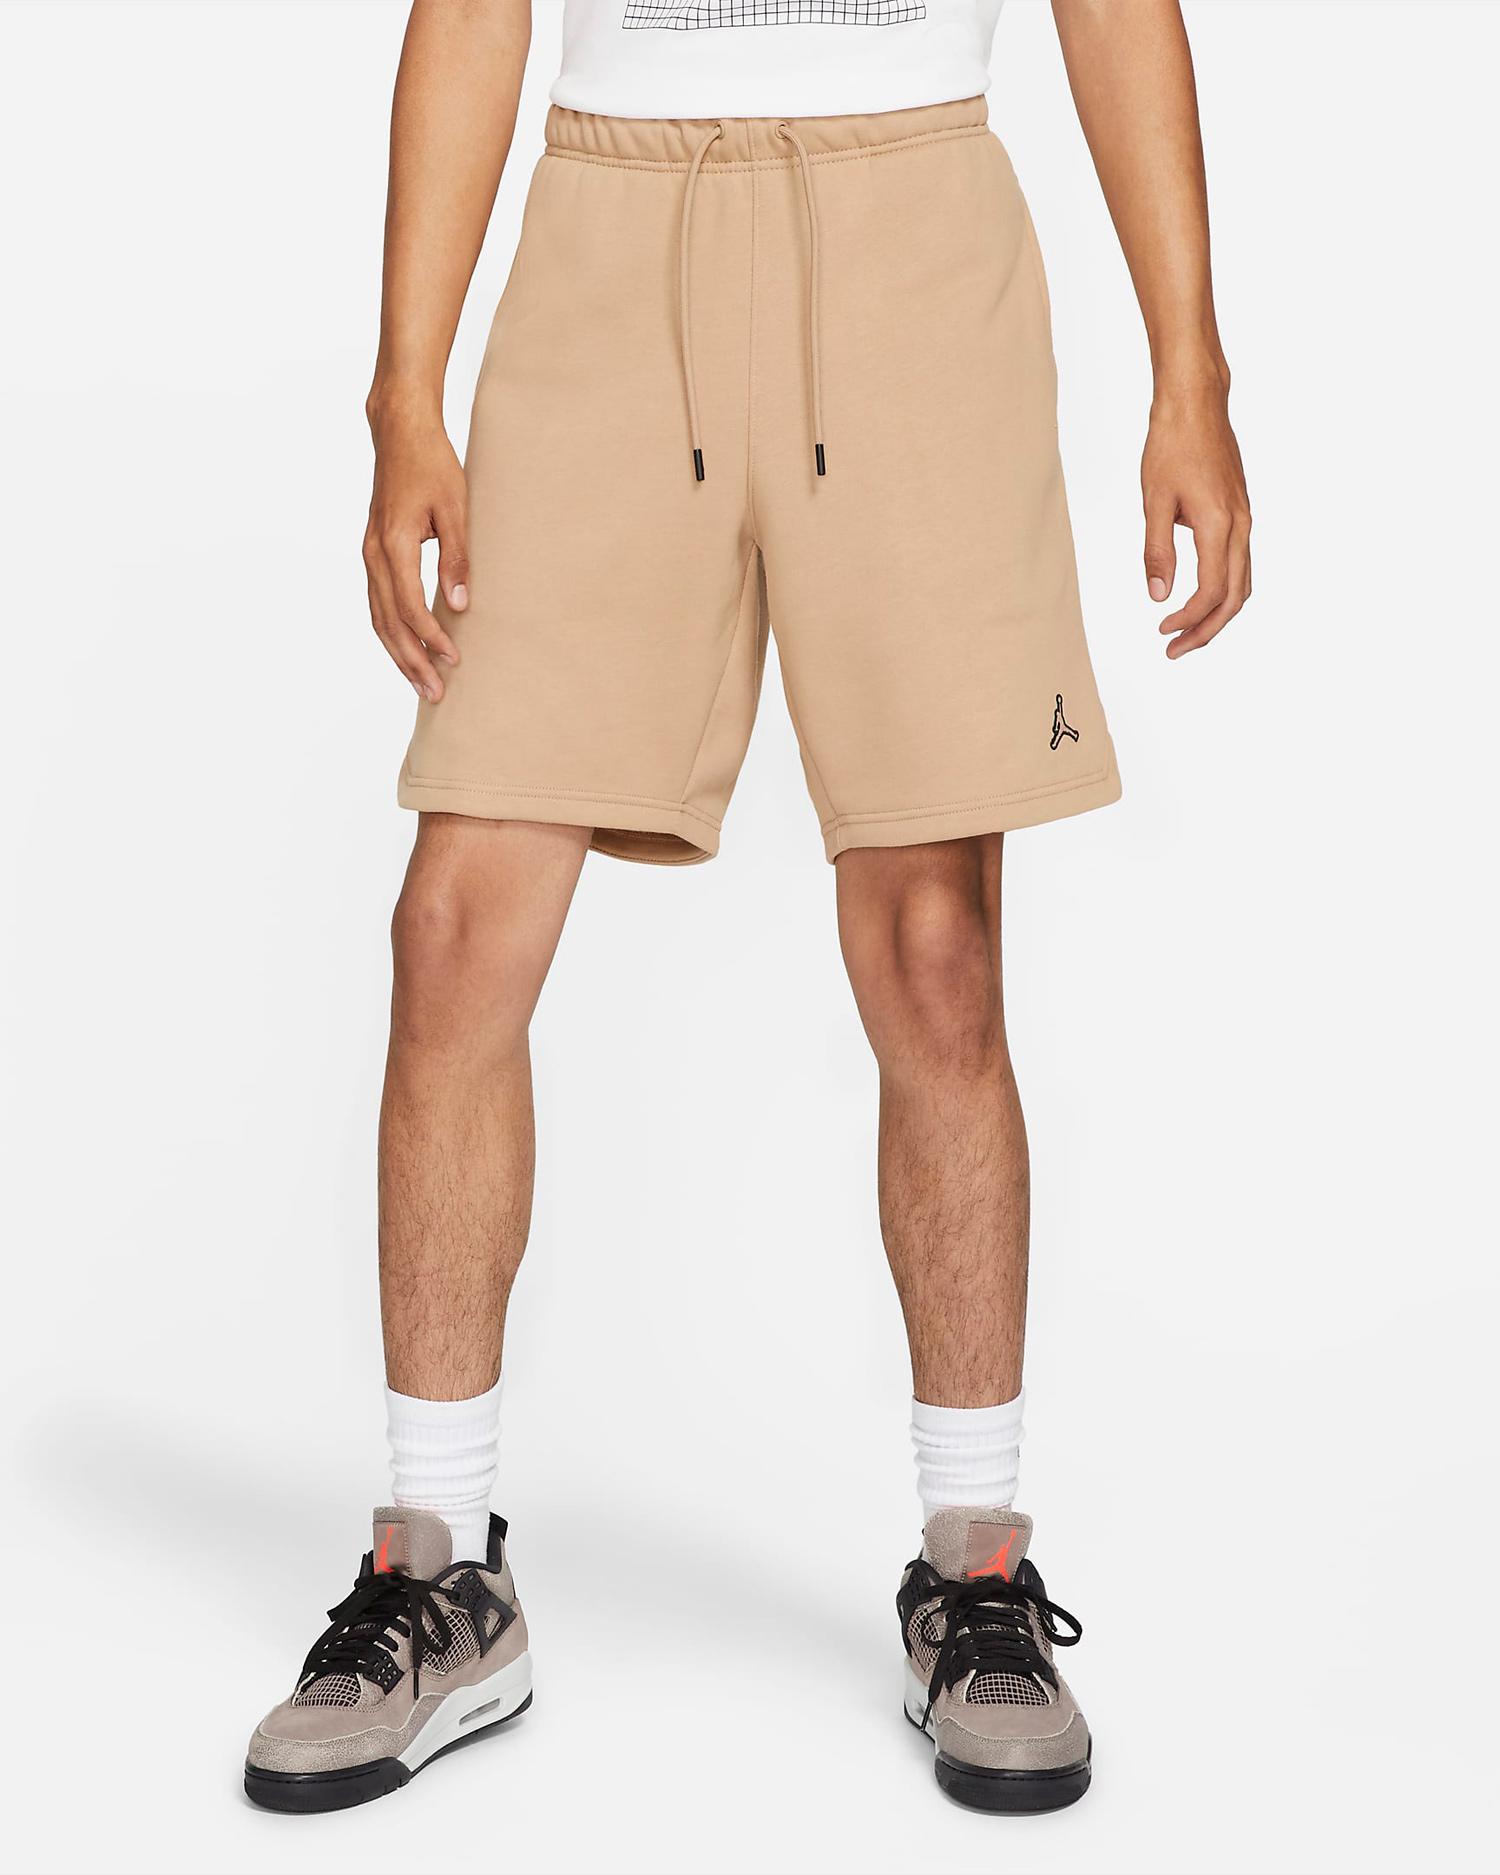 jordan-essentials-fleece-shorts-hemp-1